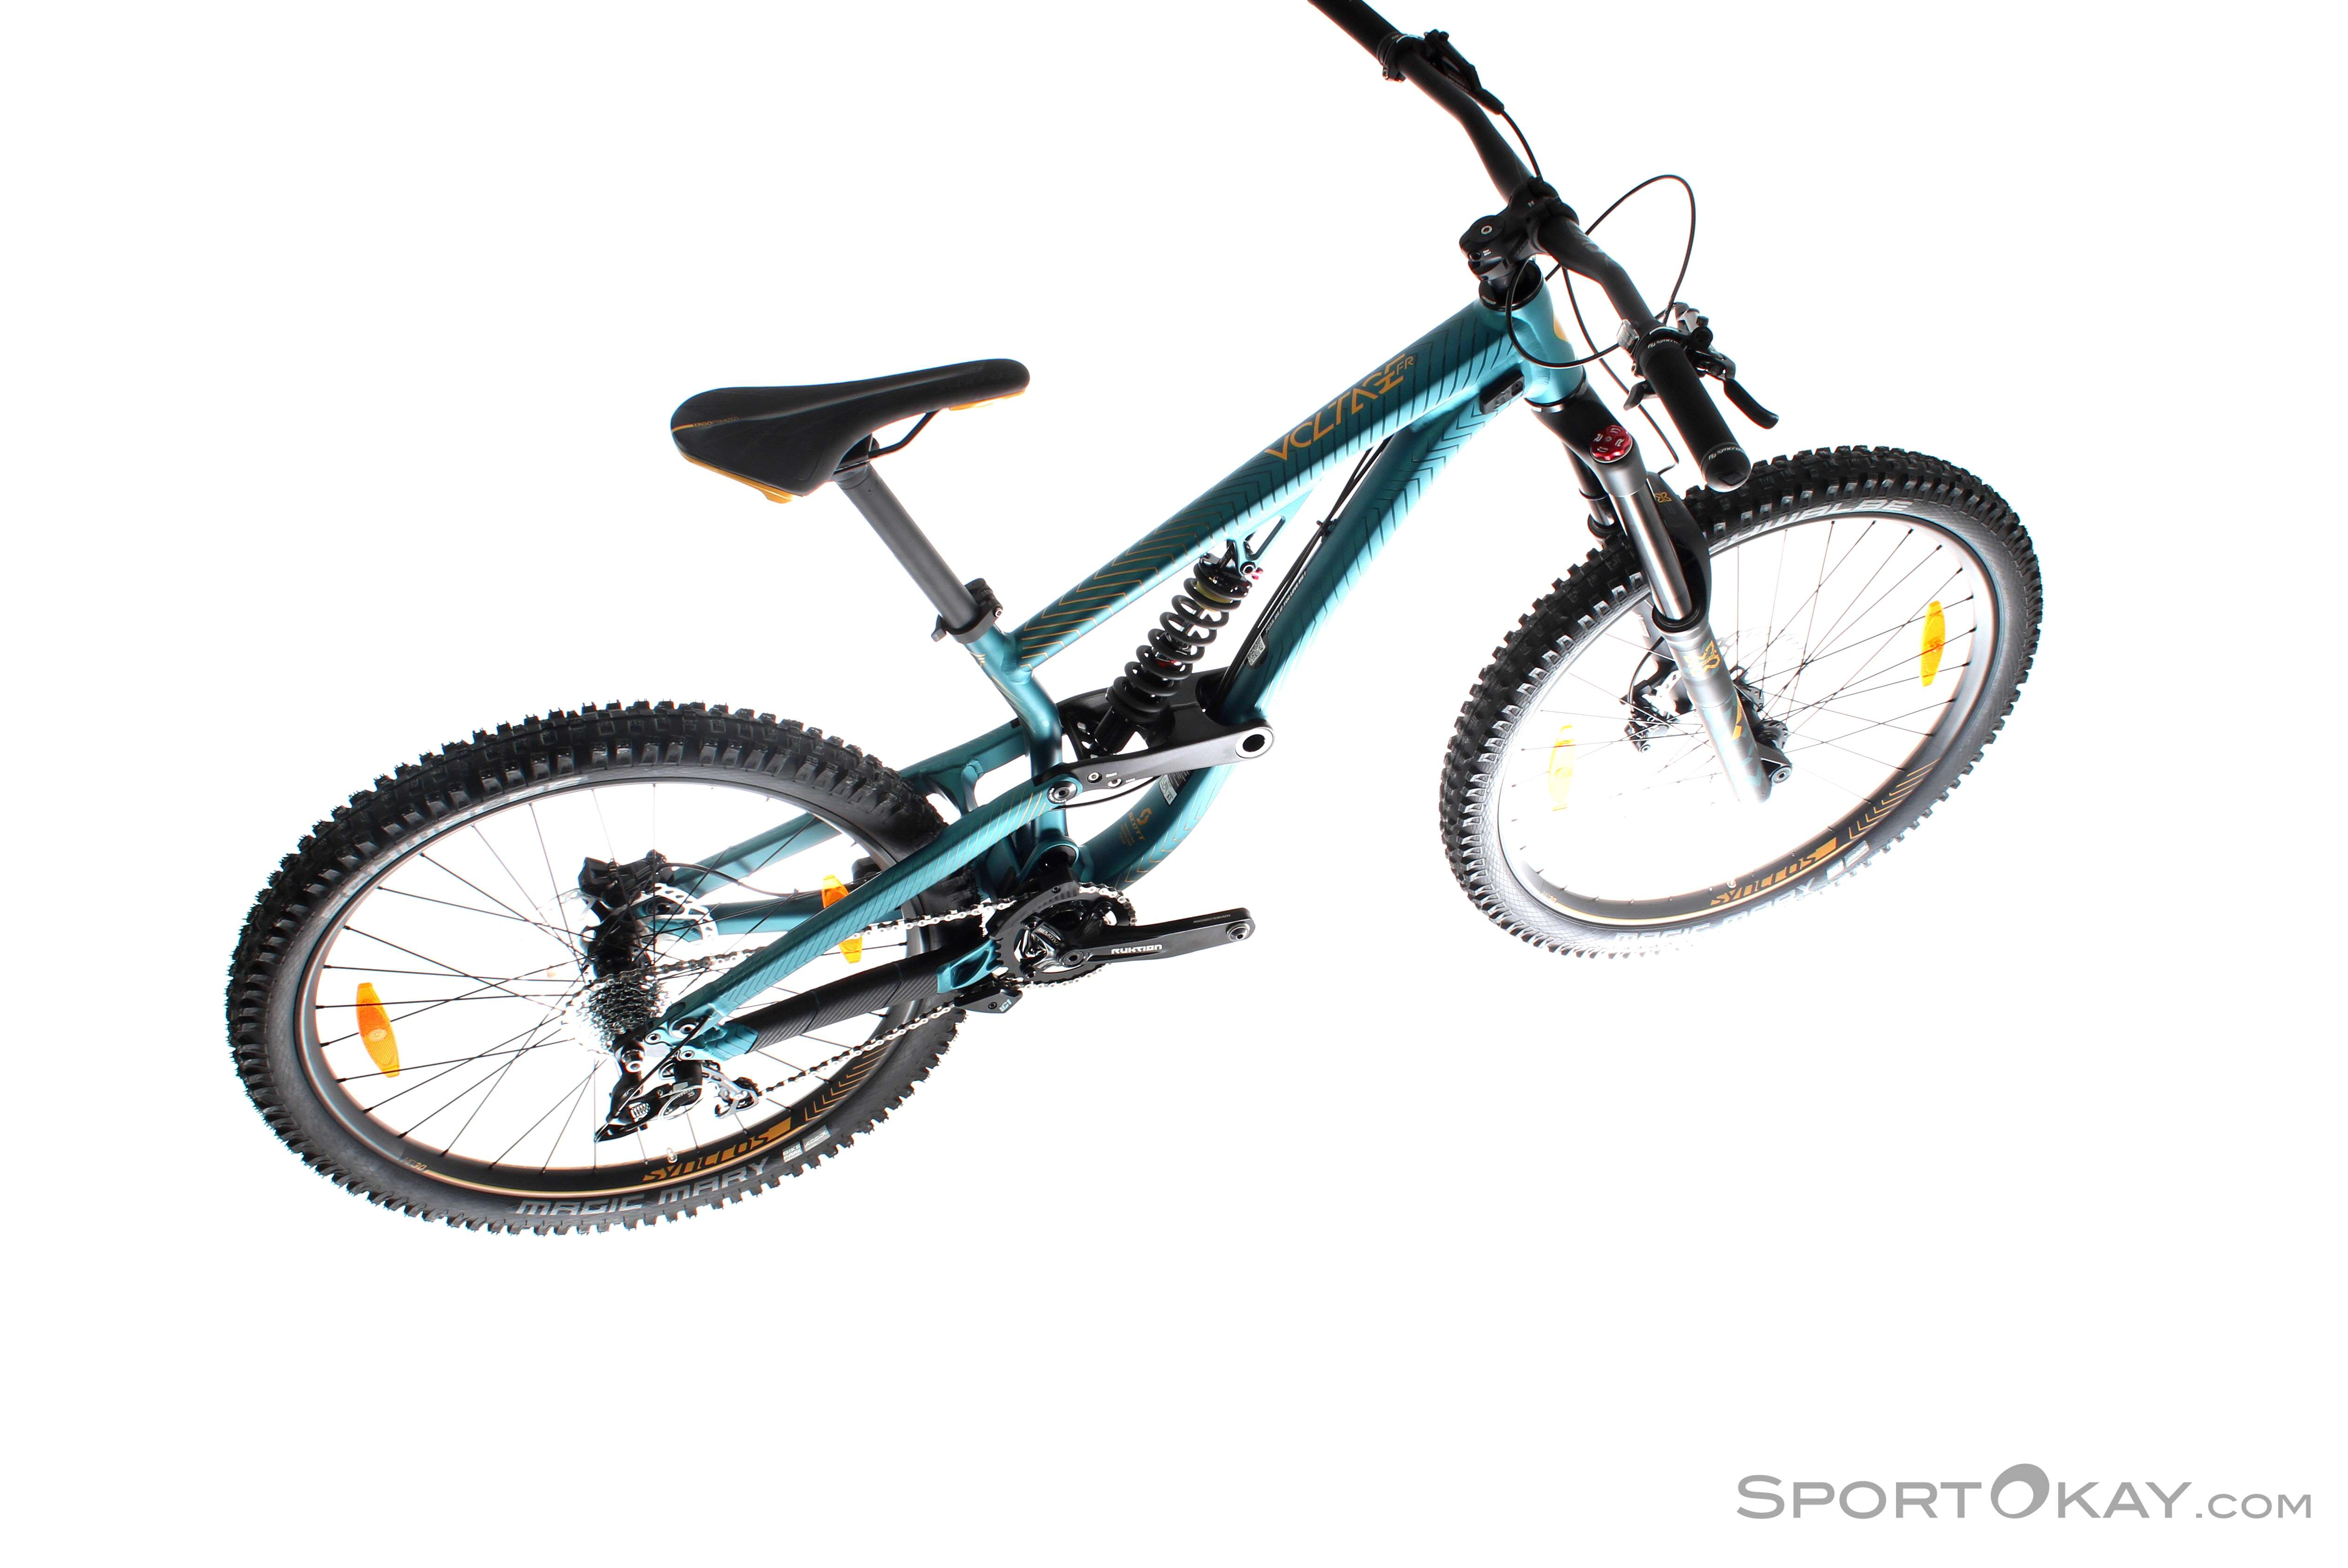 83c460b6f5 Scott Voltage FR 720 2018 Bicicletta Freeride, Scott, Blu, , Uomo, 0023